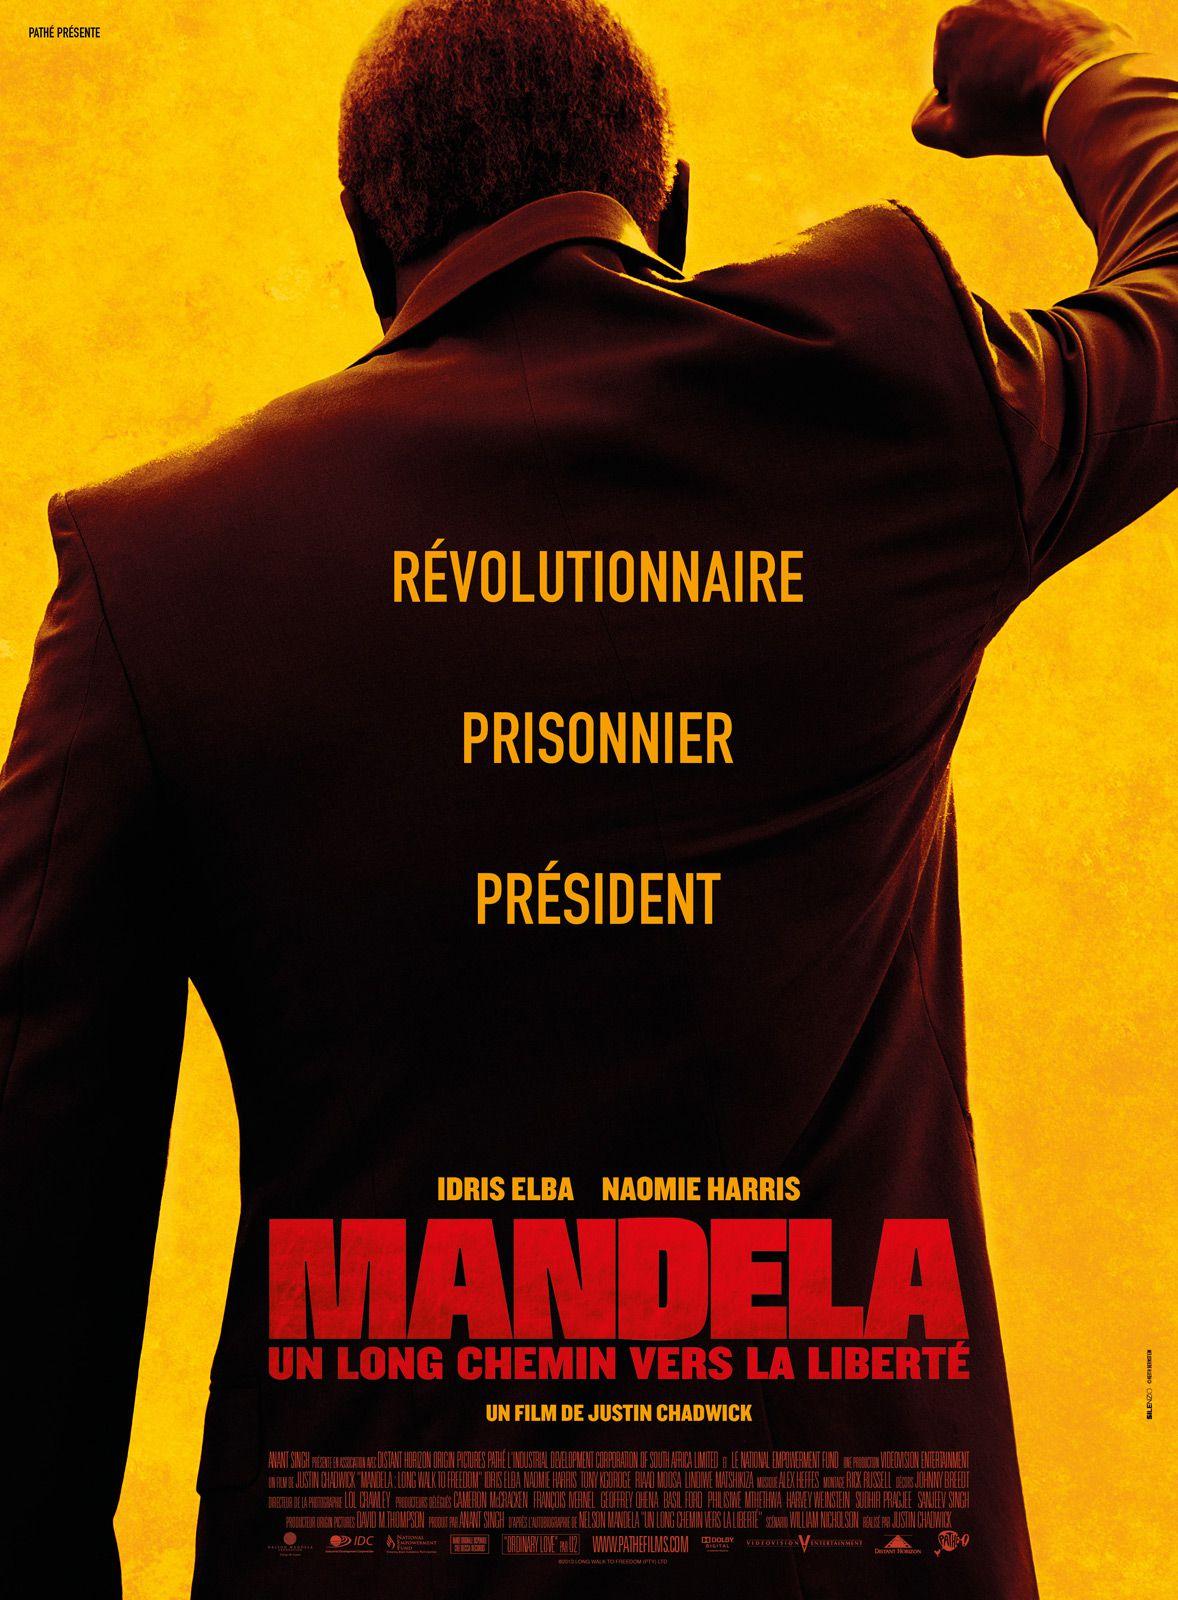 Mandela : Un long chemin vers la liberté - Film (2013)